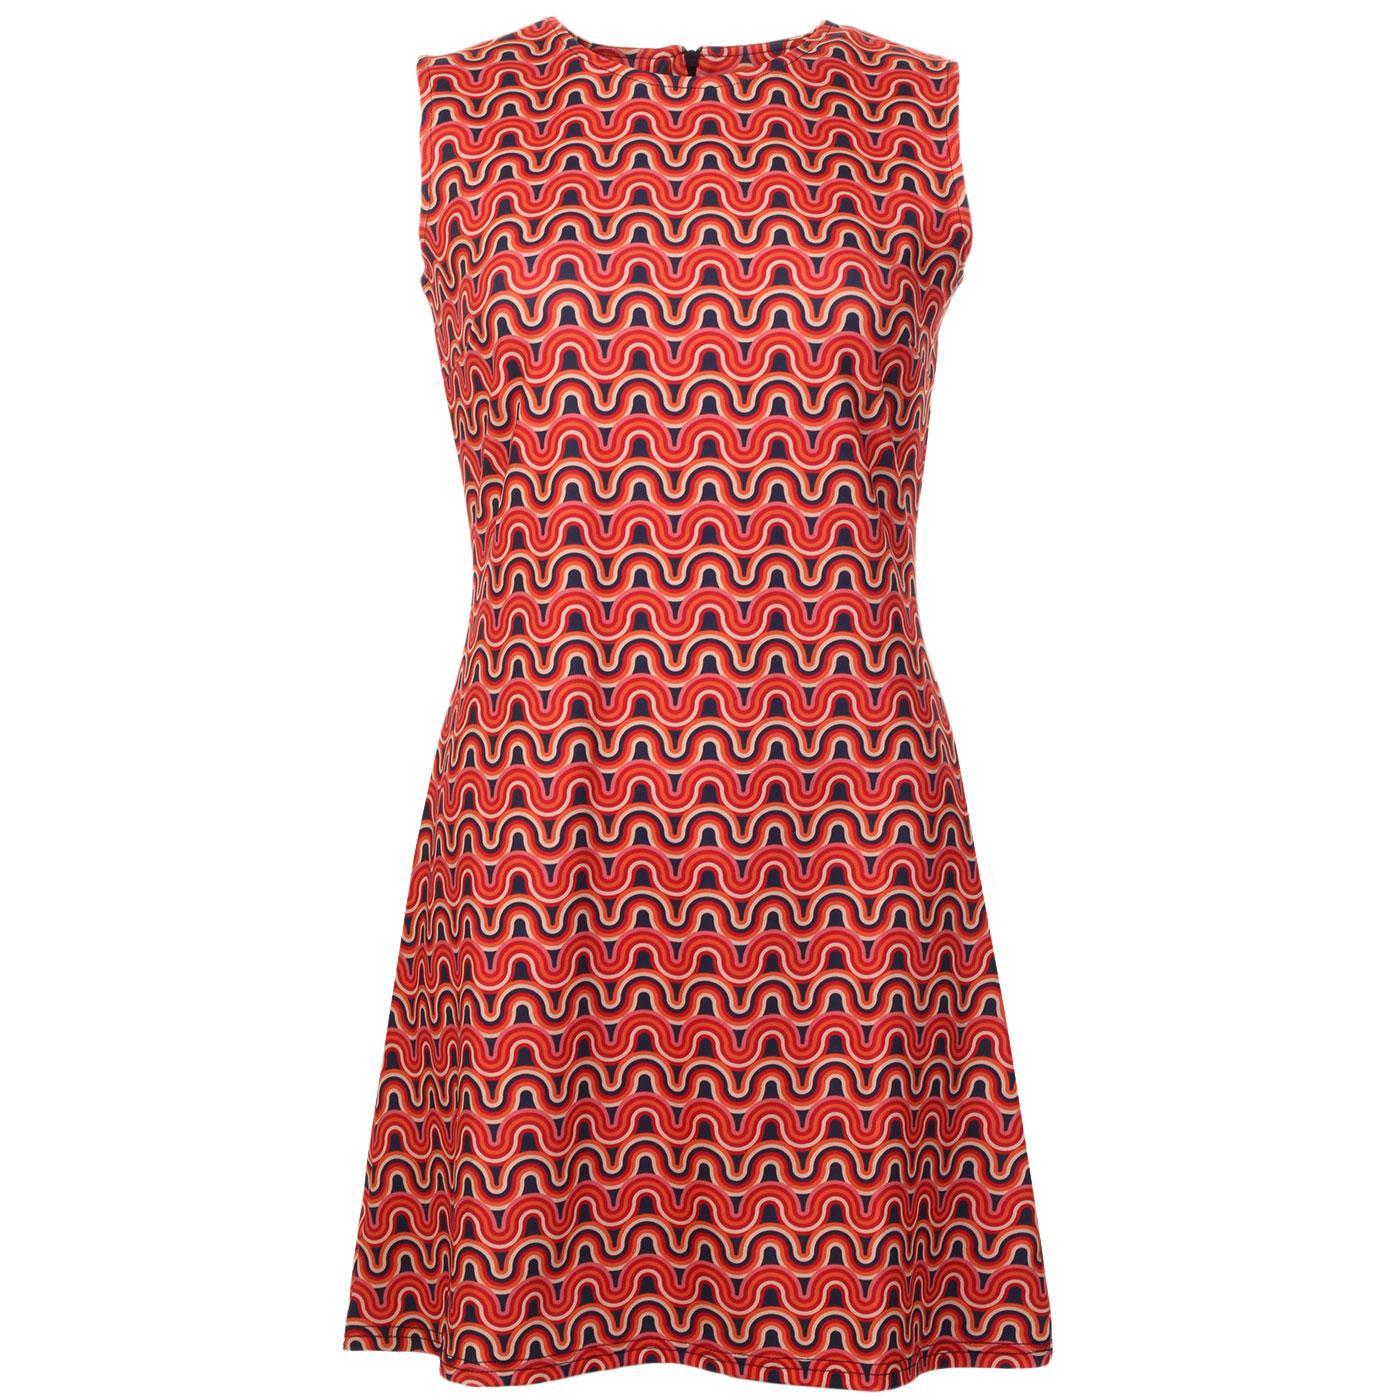 Madcap England Daytripper Retro 60s Rainbow Wavy Lines Sleeveless Shift Dress